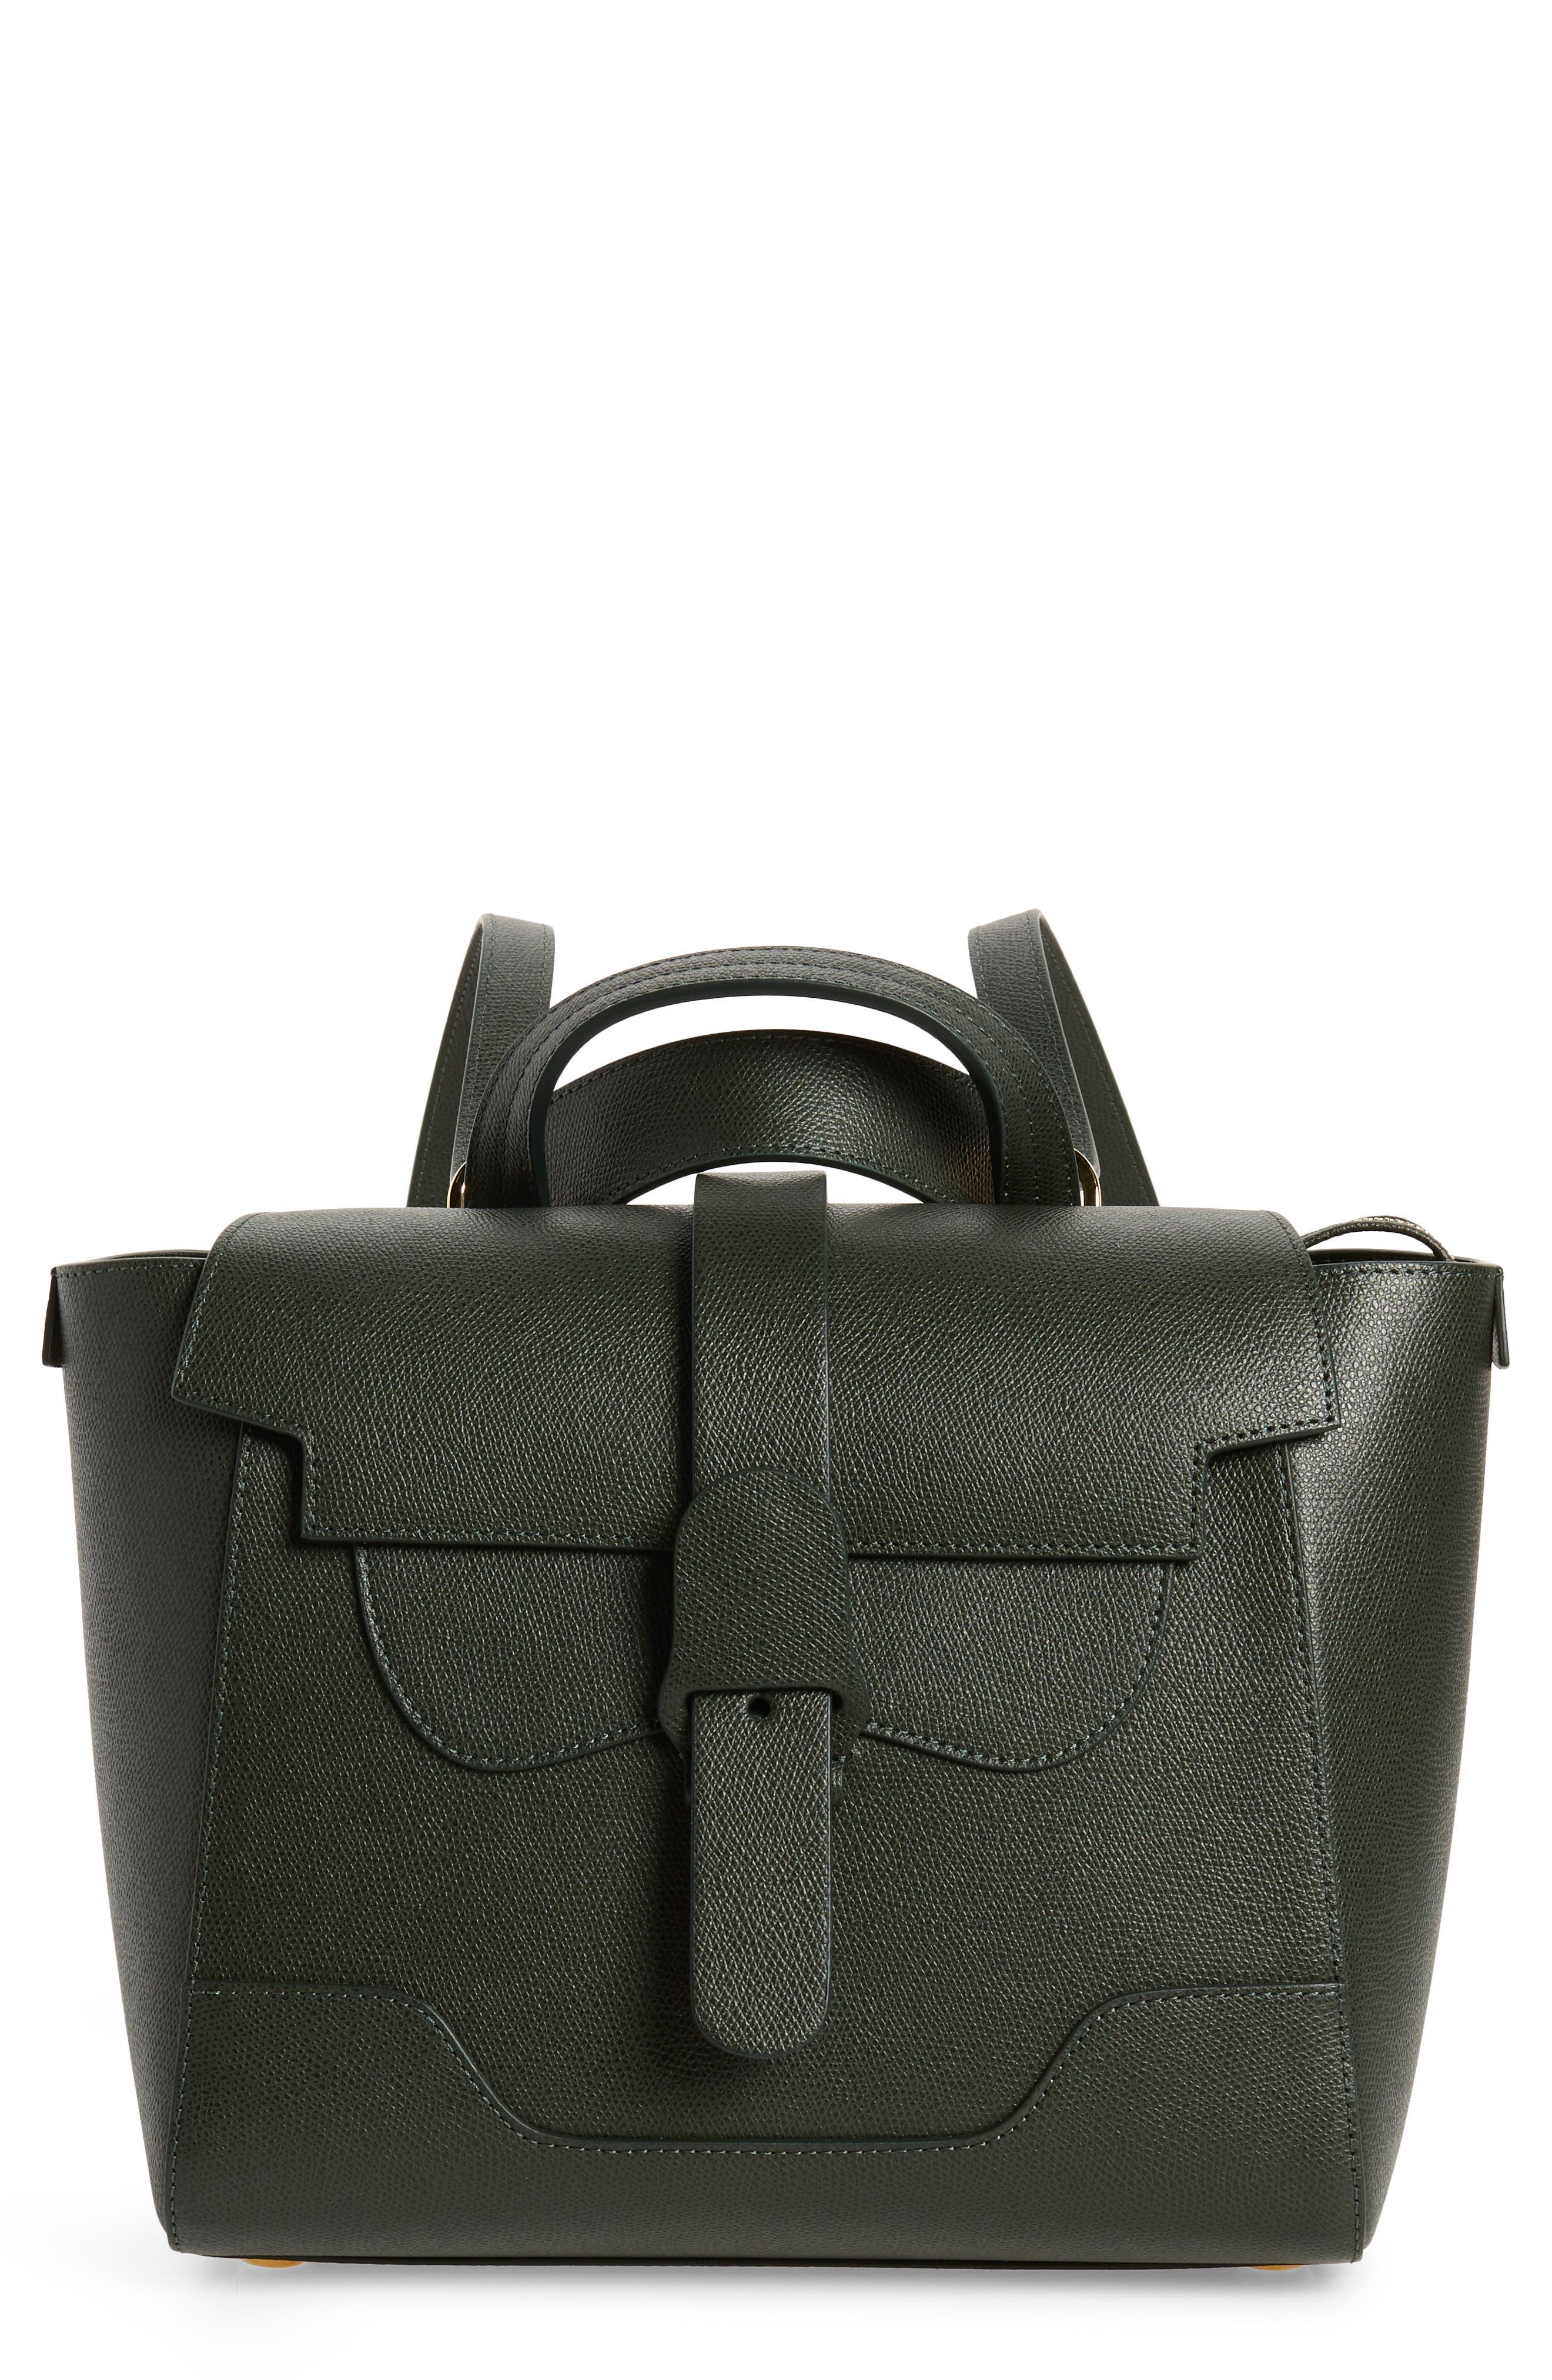 d5baef976b SENREVE Handbags   Wallets for Women